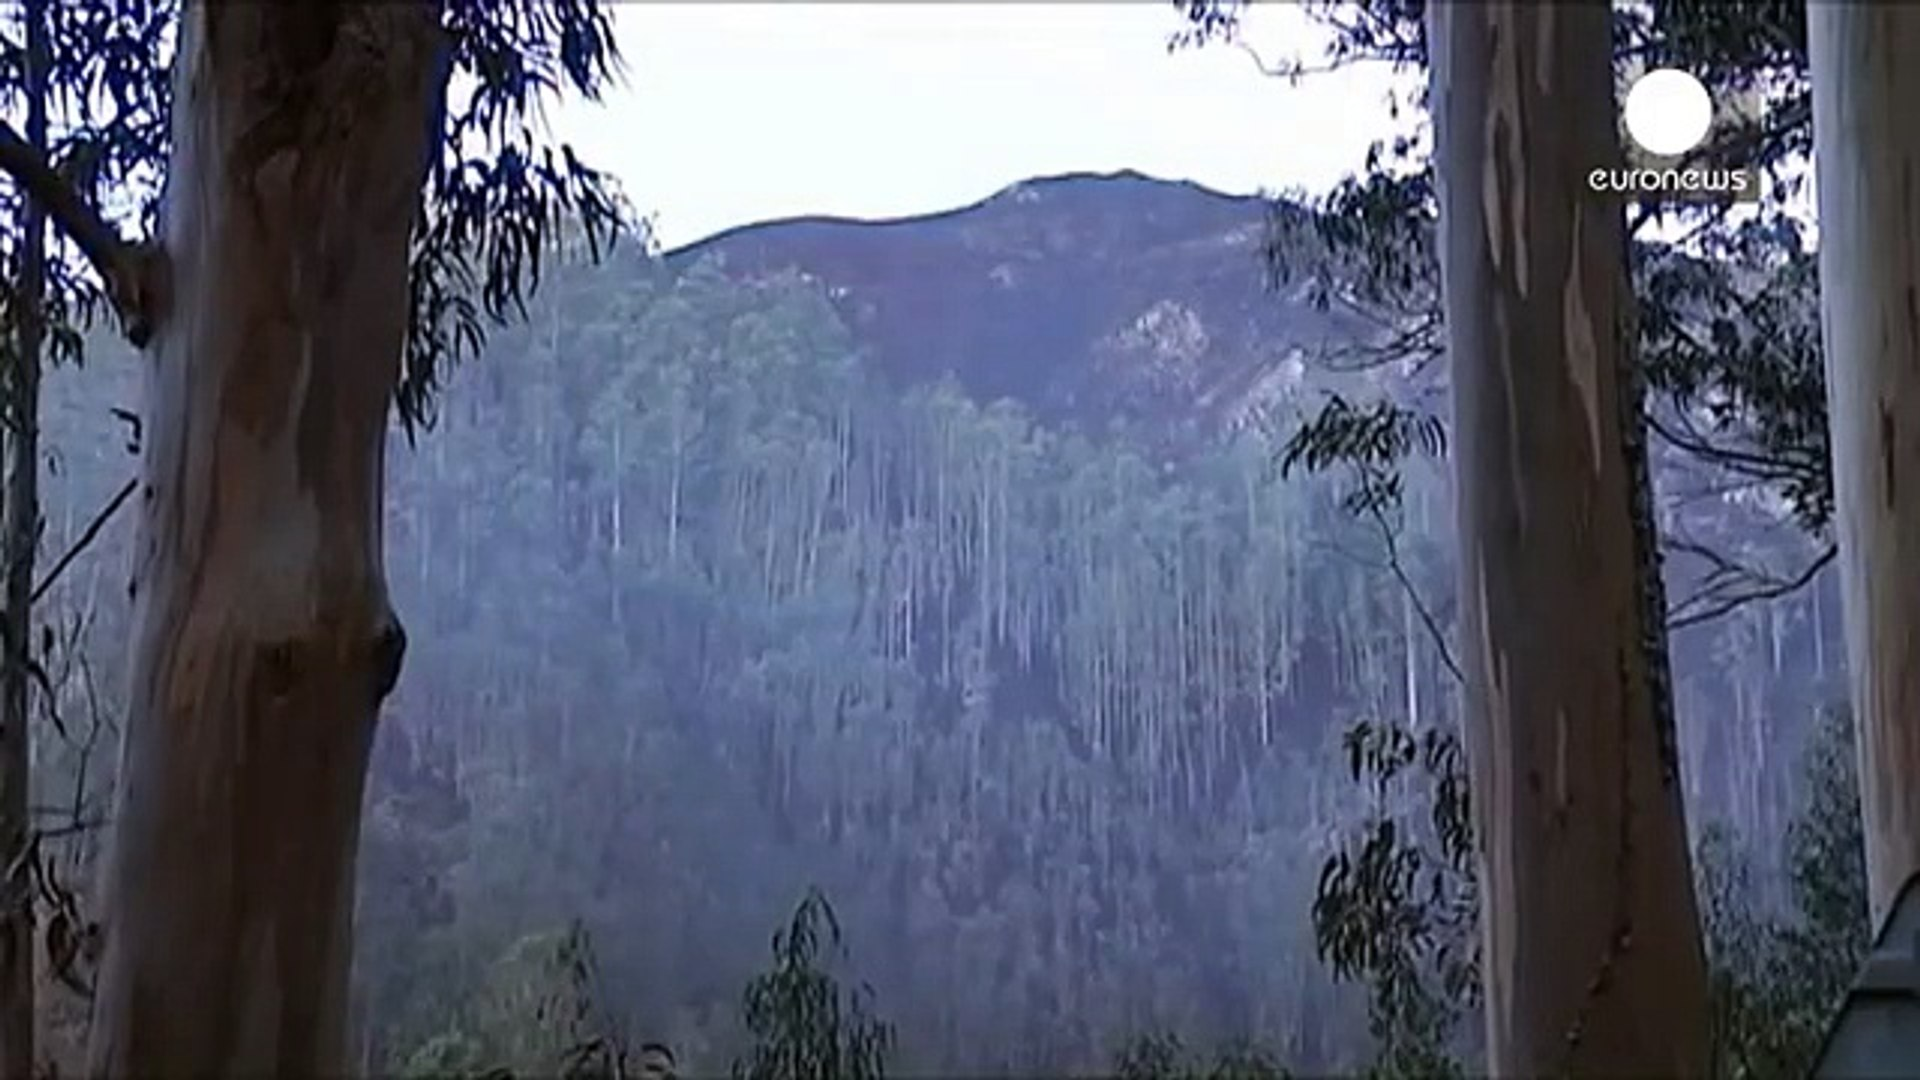 Northern Spain wildfires